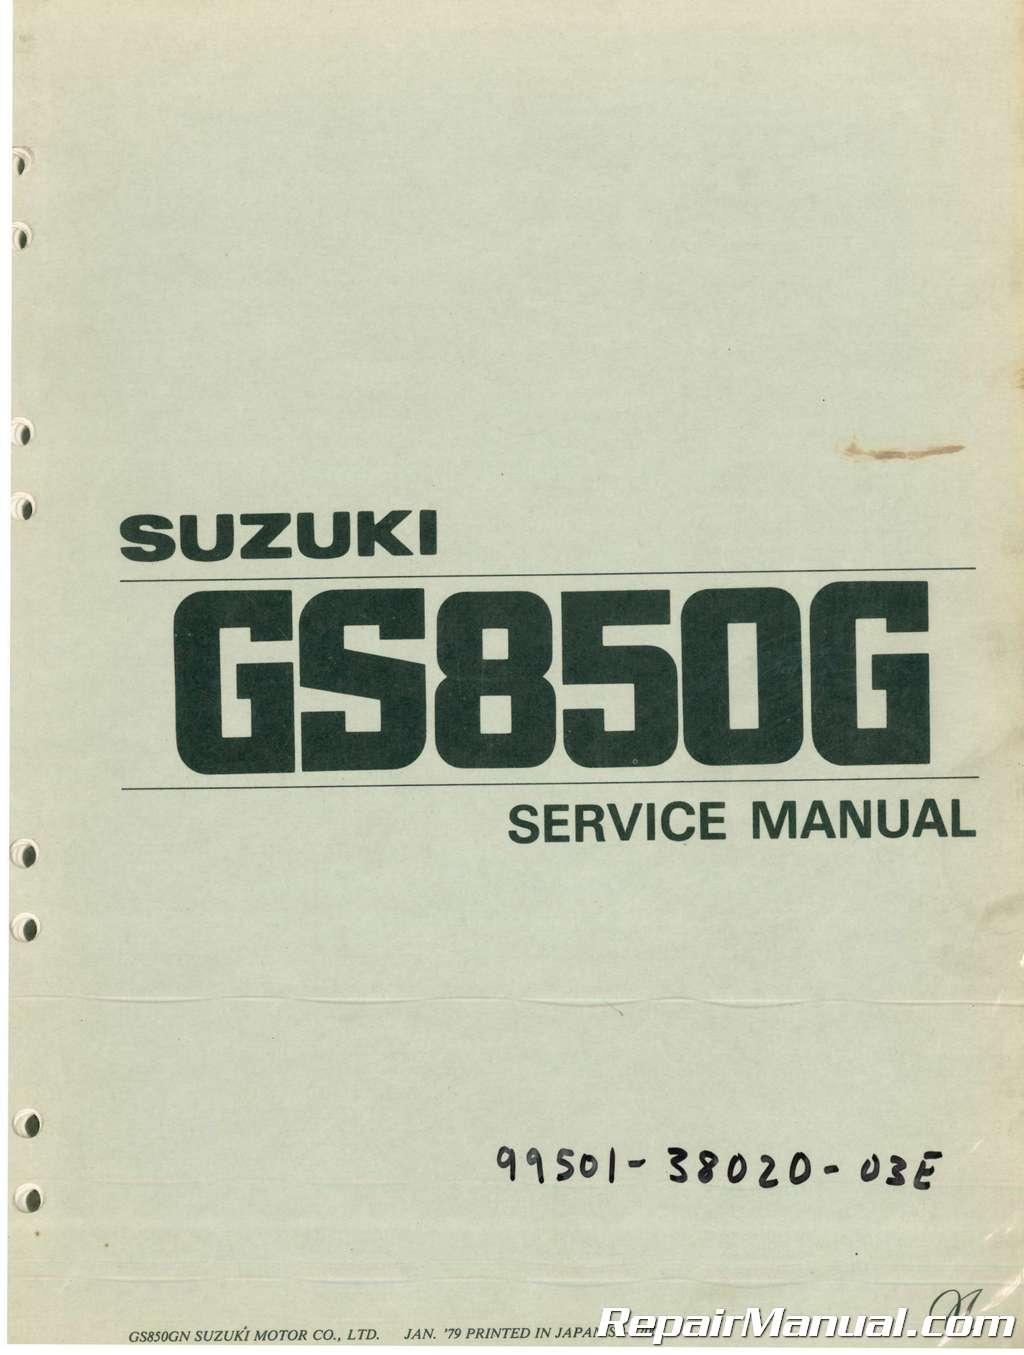 used 1978 1983 suzuki gs850g service manual rh repairmanual com suzuki gs850g service manual free download 1979 suzuki gs850 service manual